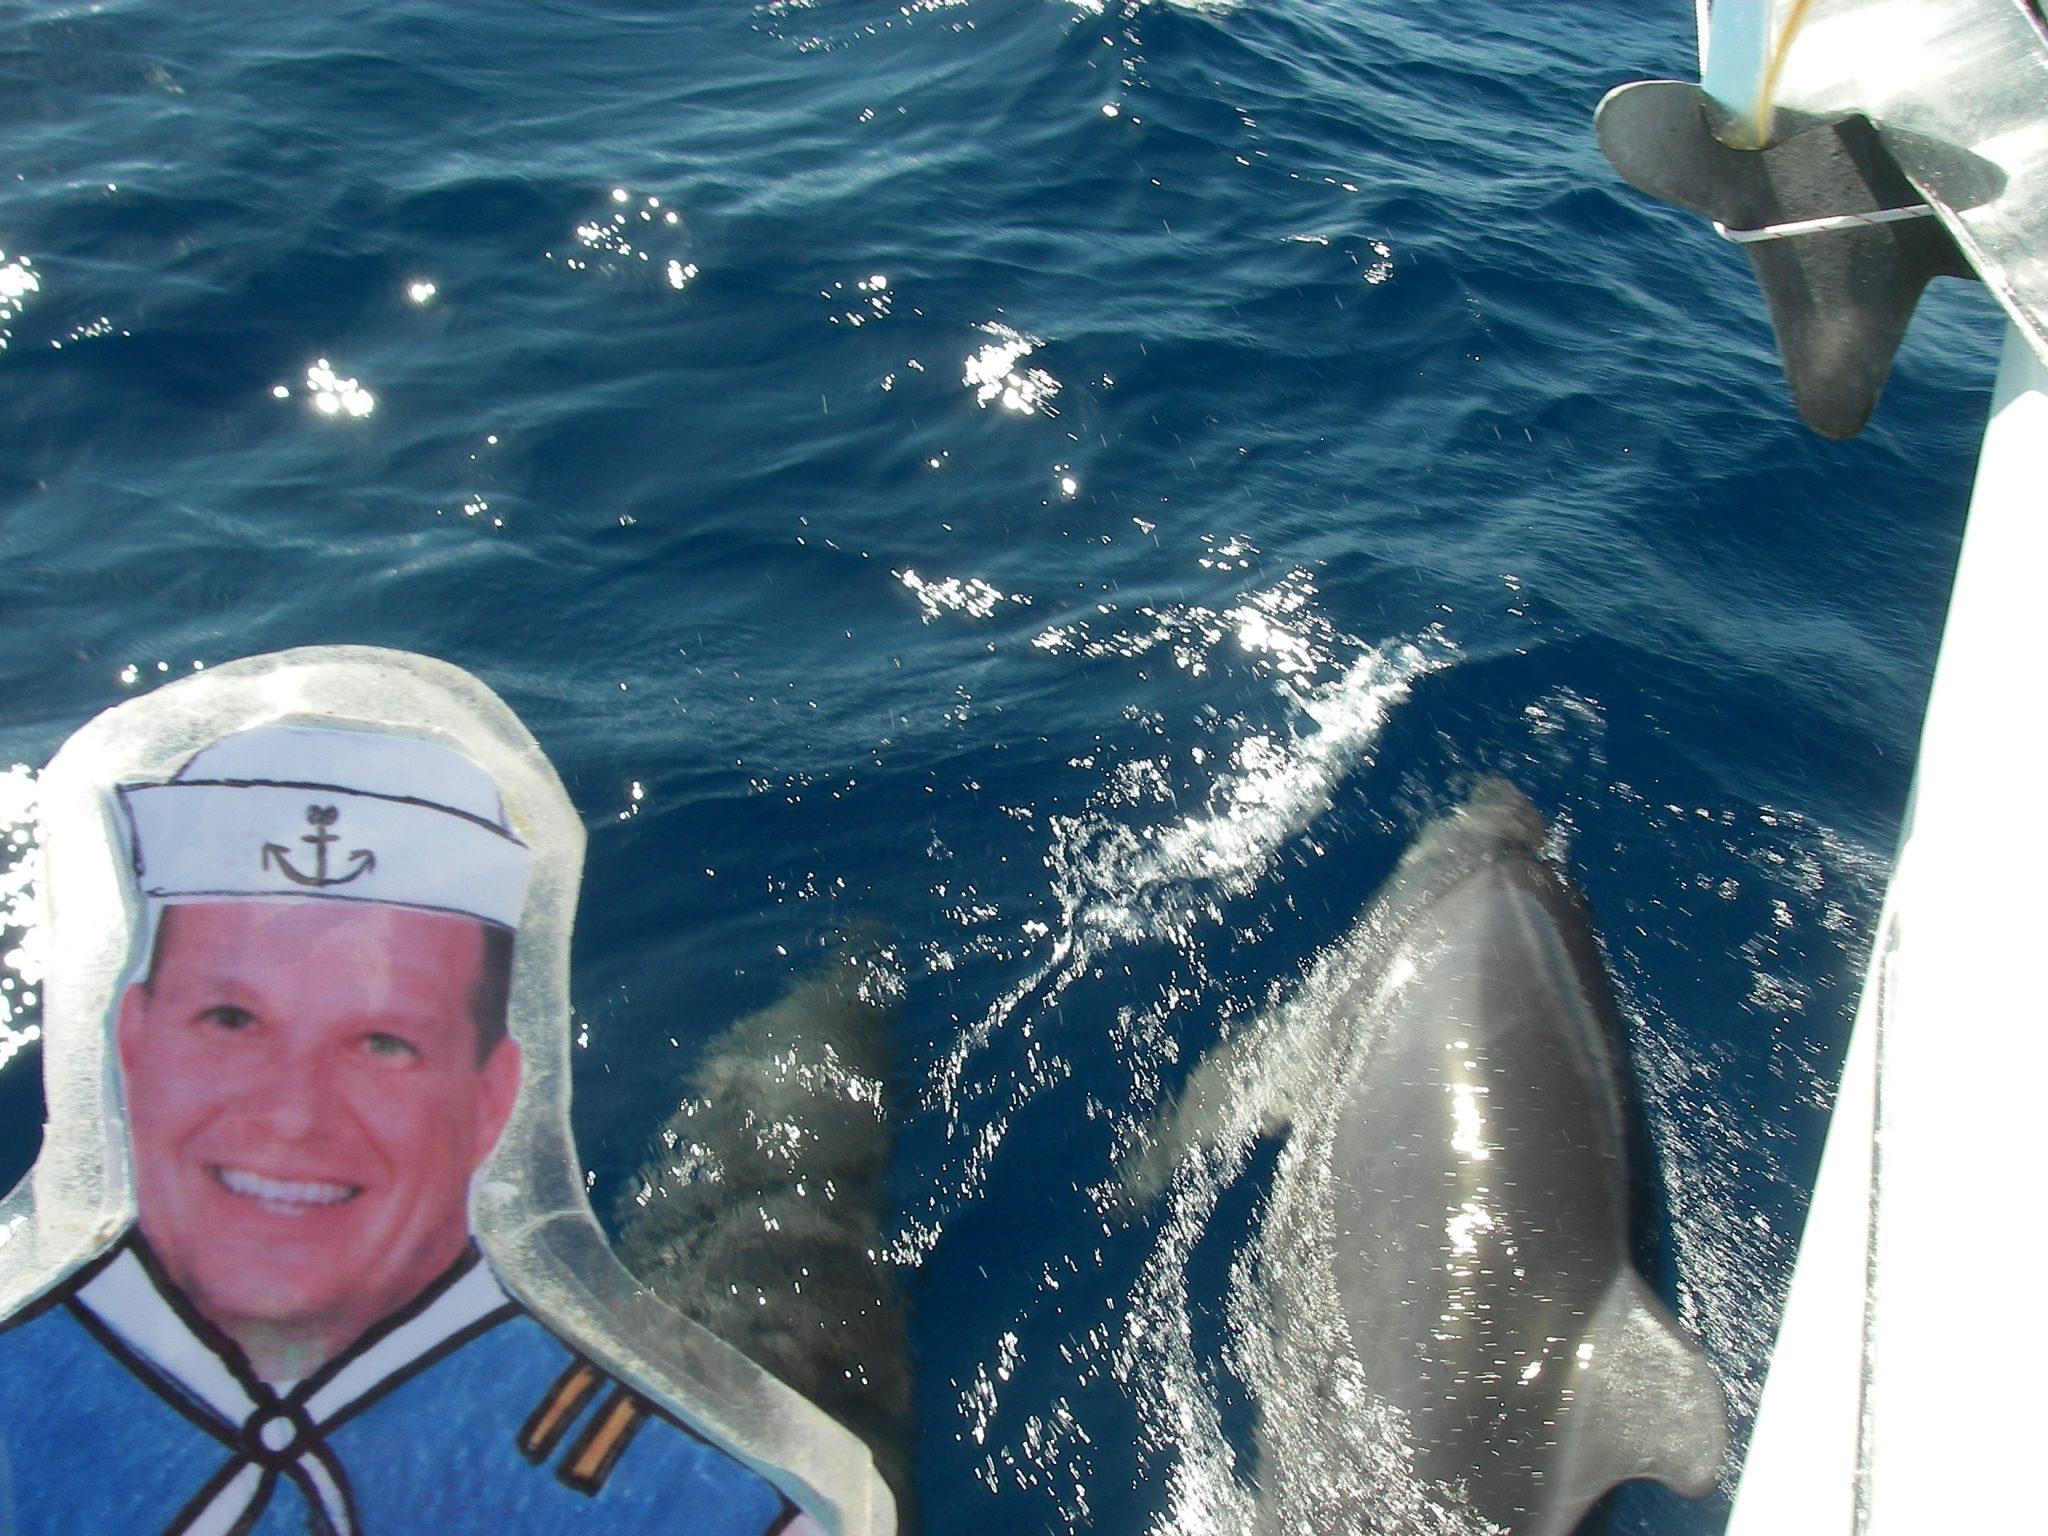 46. Flat Mr. Davis liked Joyful's dolphin friends